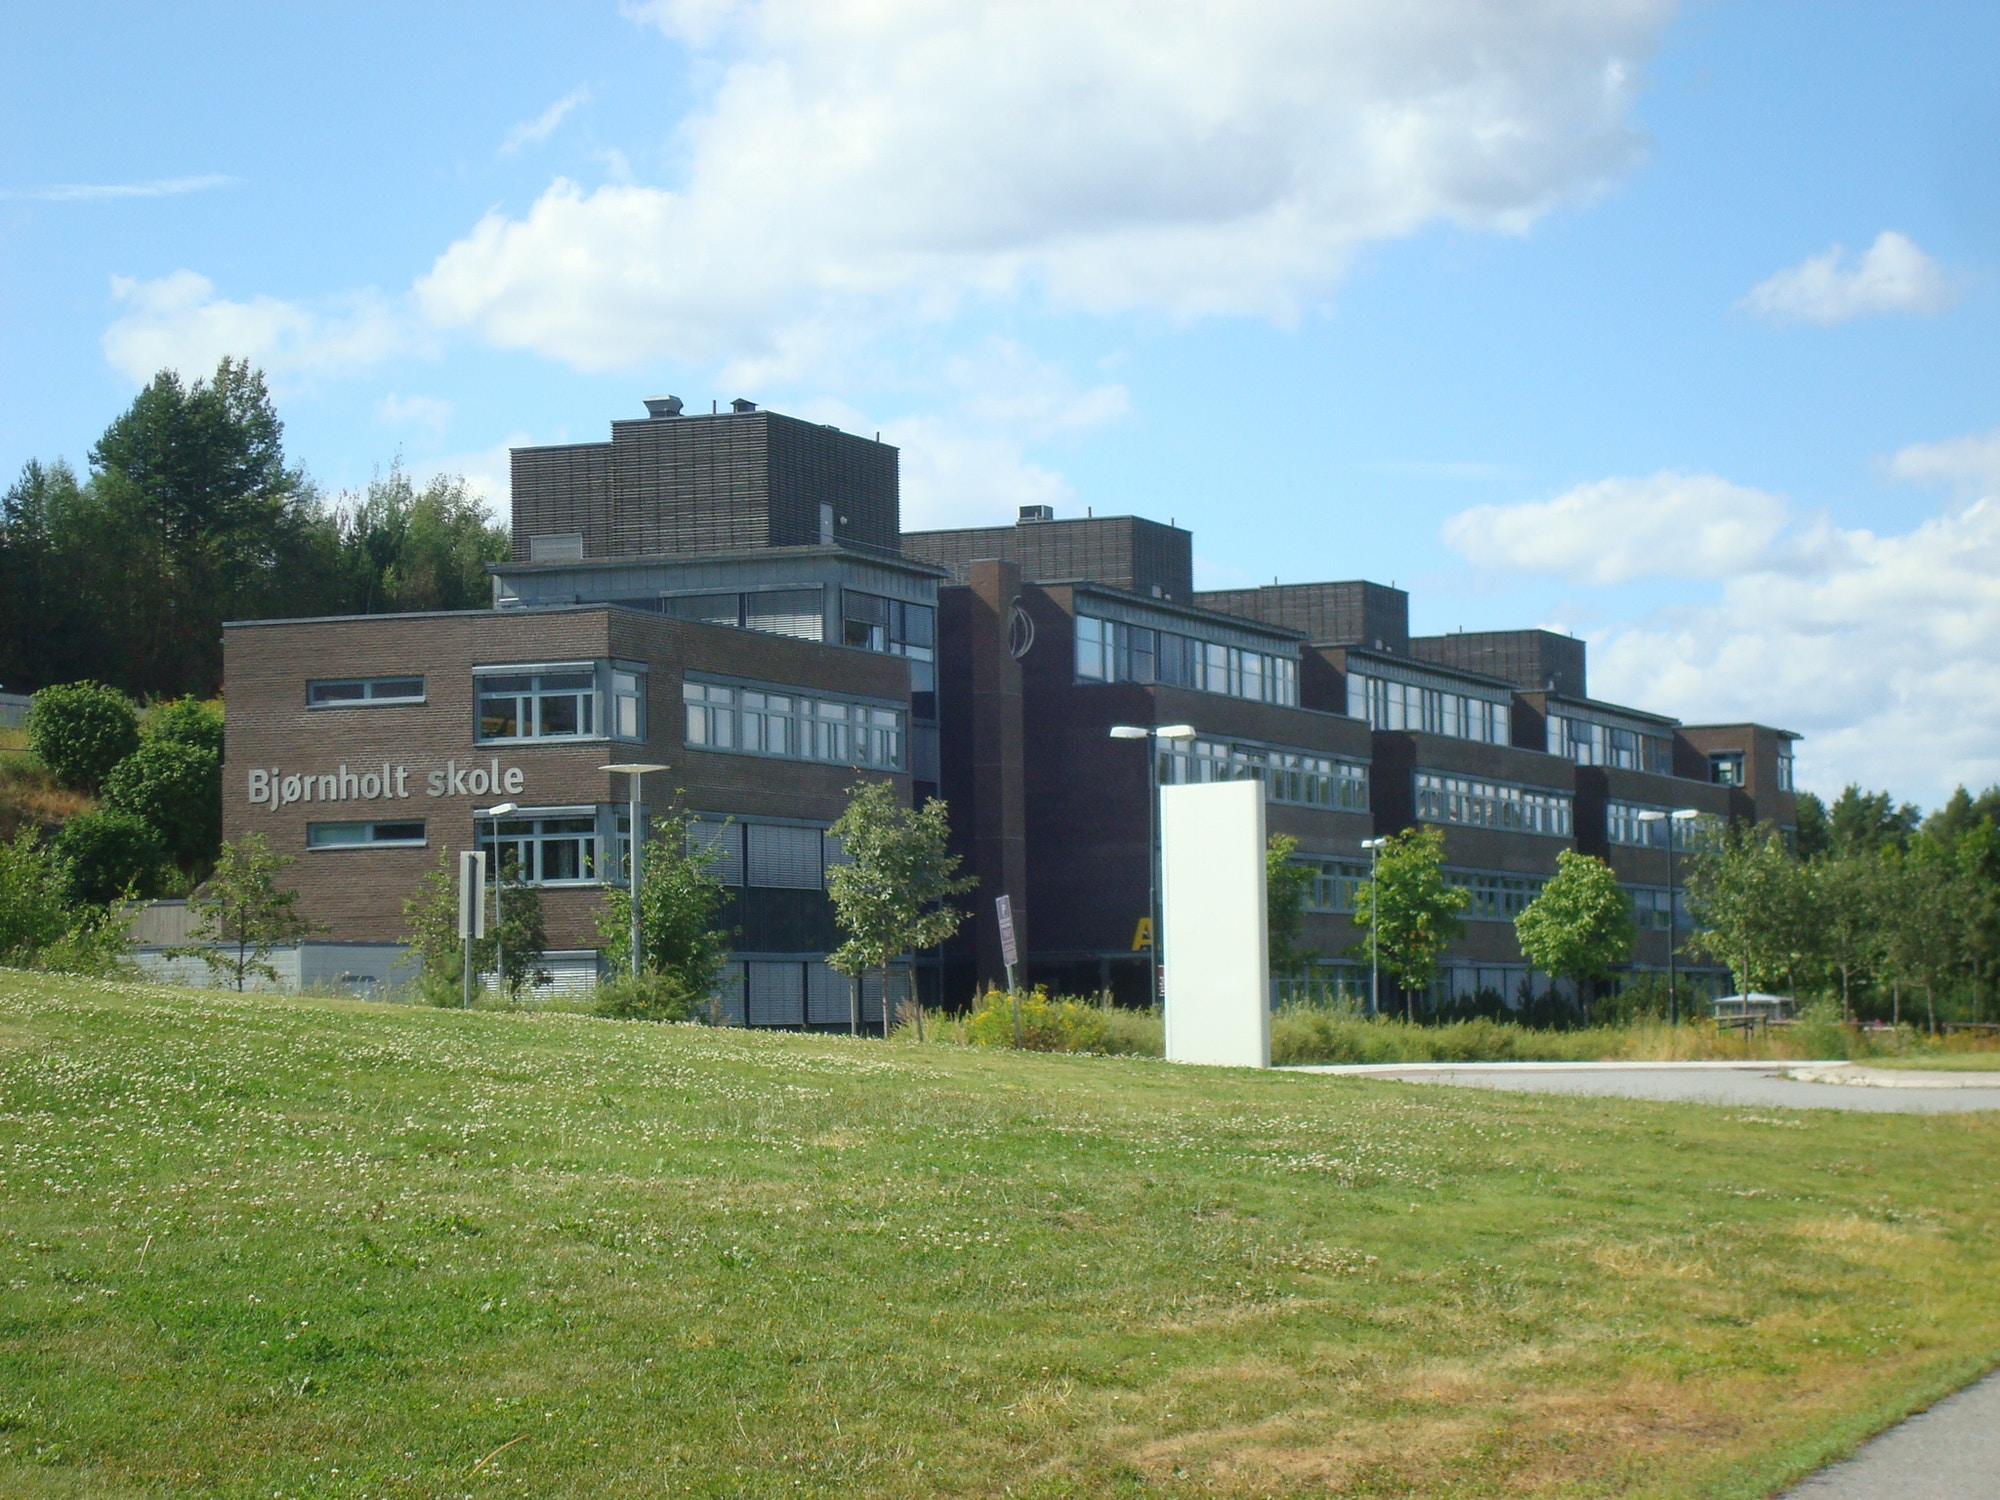 Bjornholt skole stor